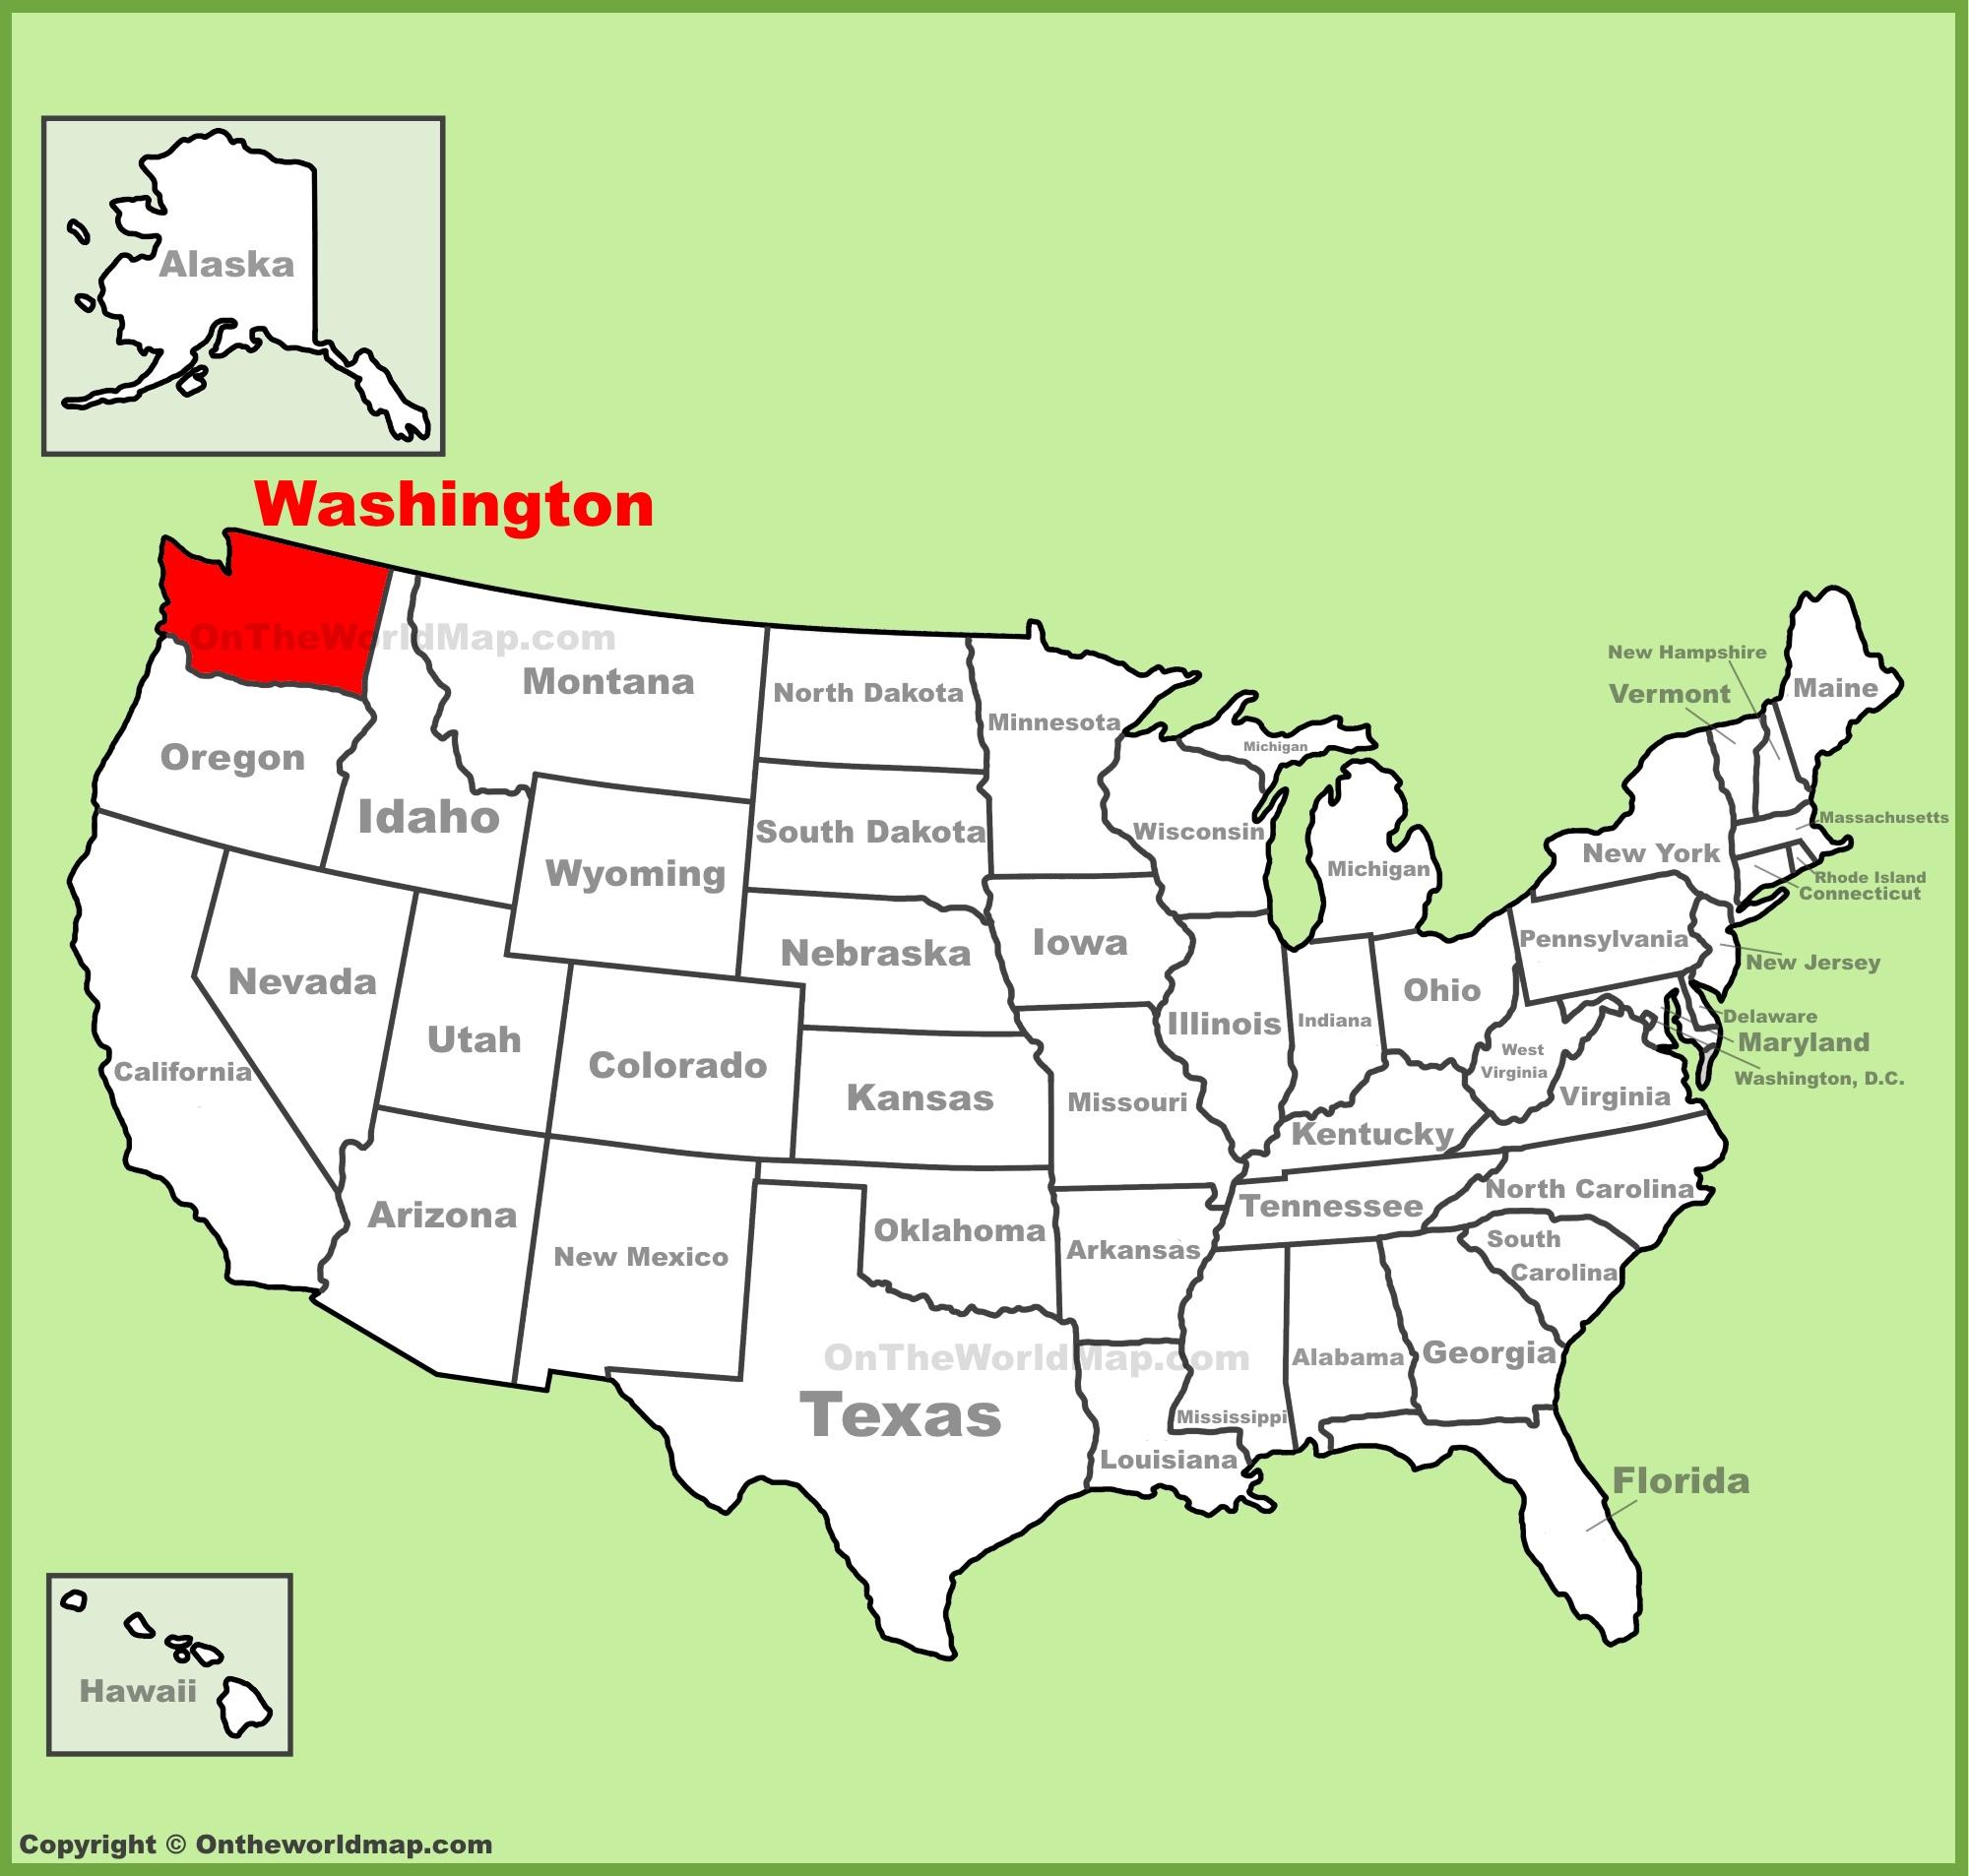 Washington (state) location on the U.S. Map